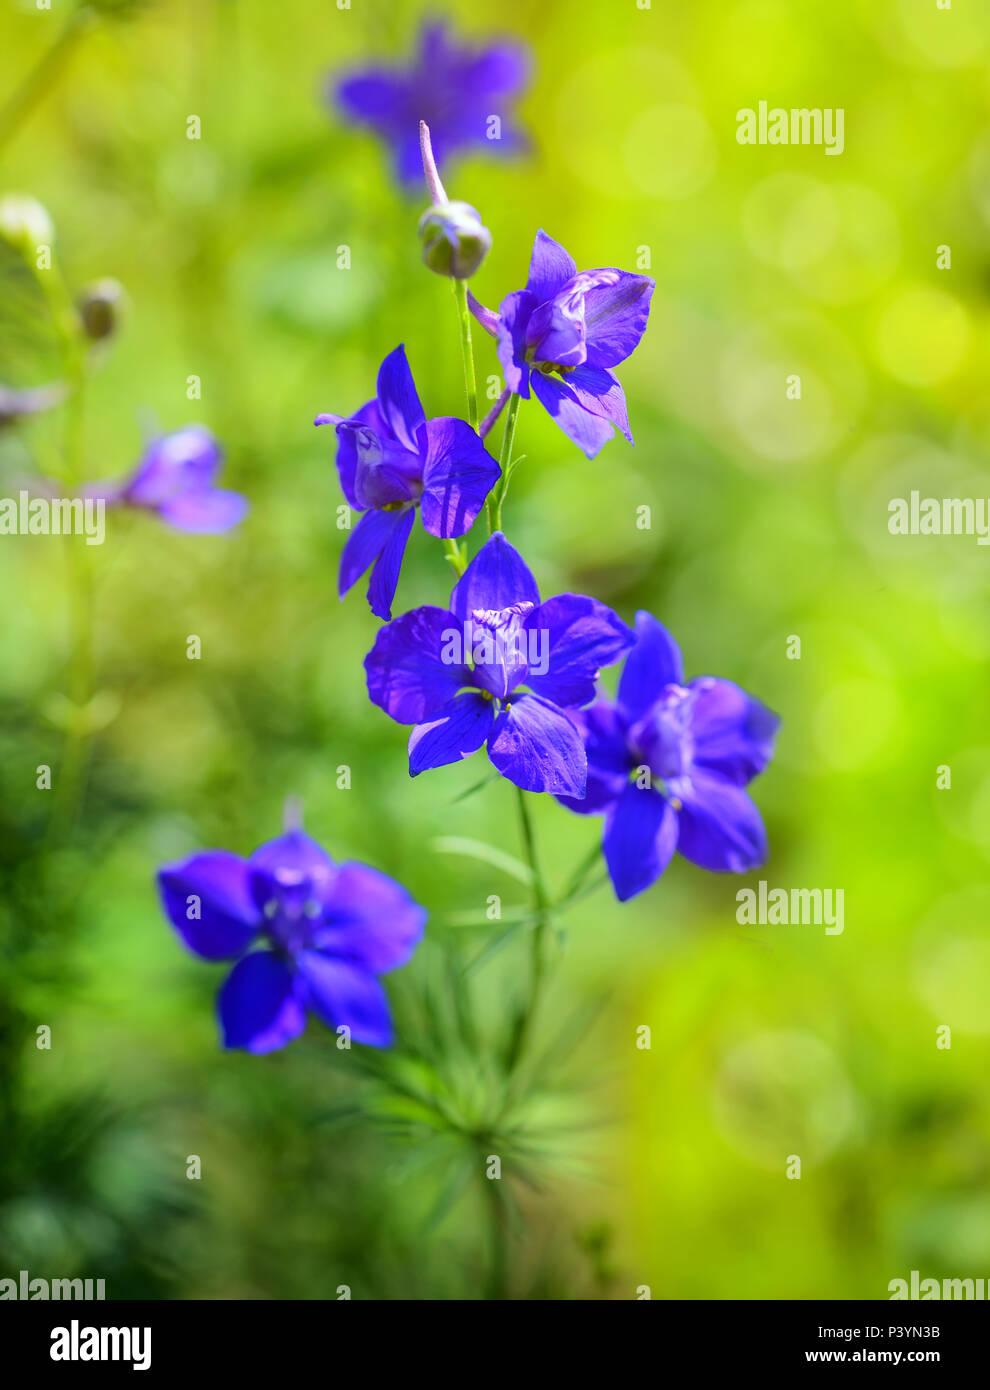 Beautiful purple Delphinium consolida (Consolida regalis) on a nature background - Stock Image